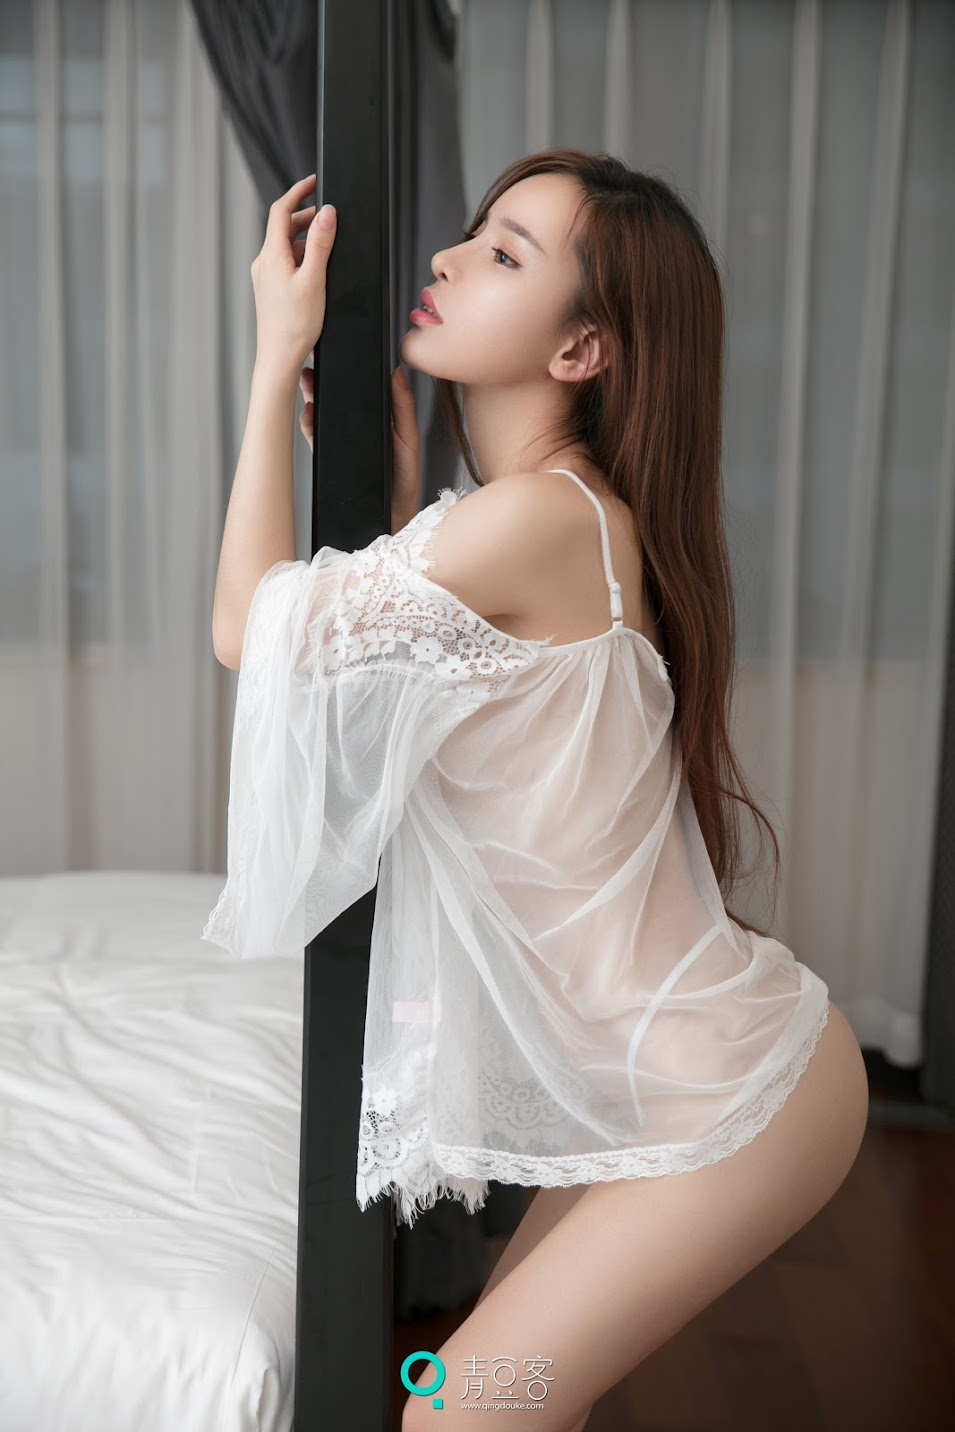 QingDouKe青豆客 NO060 2017.07.06 艾小青 [52+1P-196M]Real Street Angels